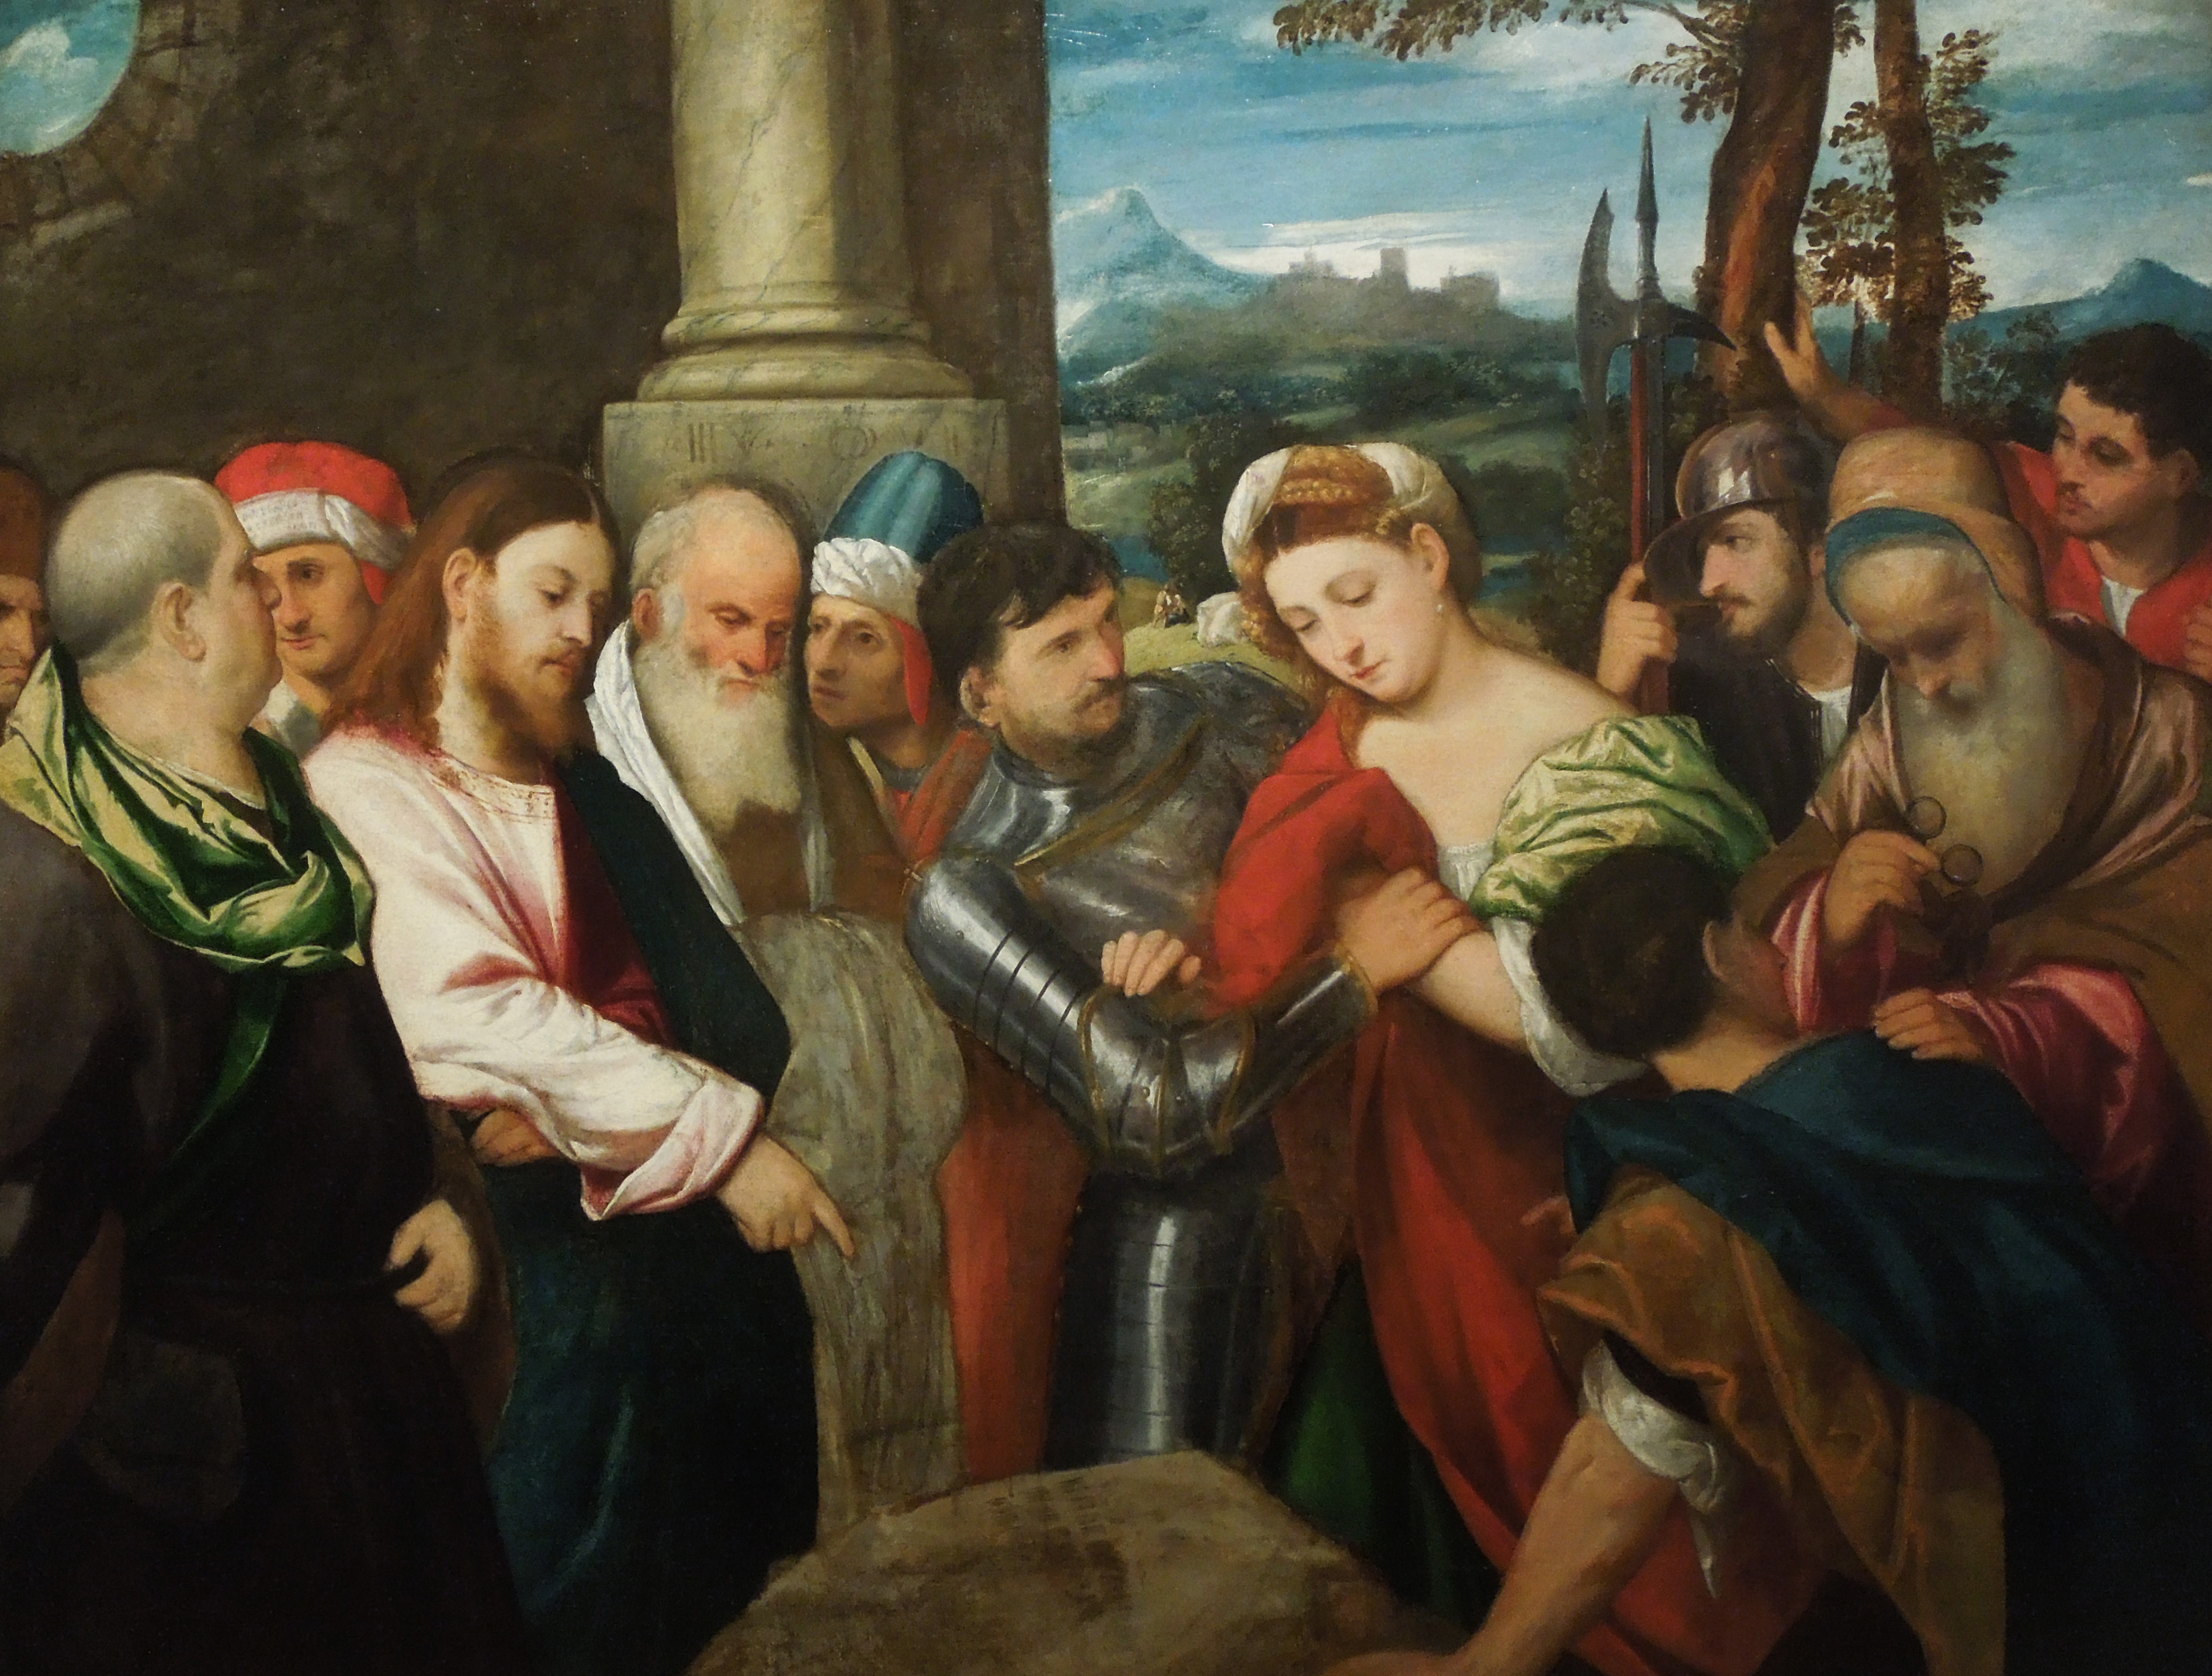 File:Bonifacio de' Pitati - Christ with the Adulteress jpg